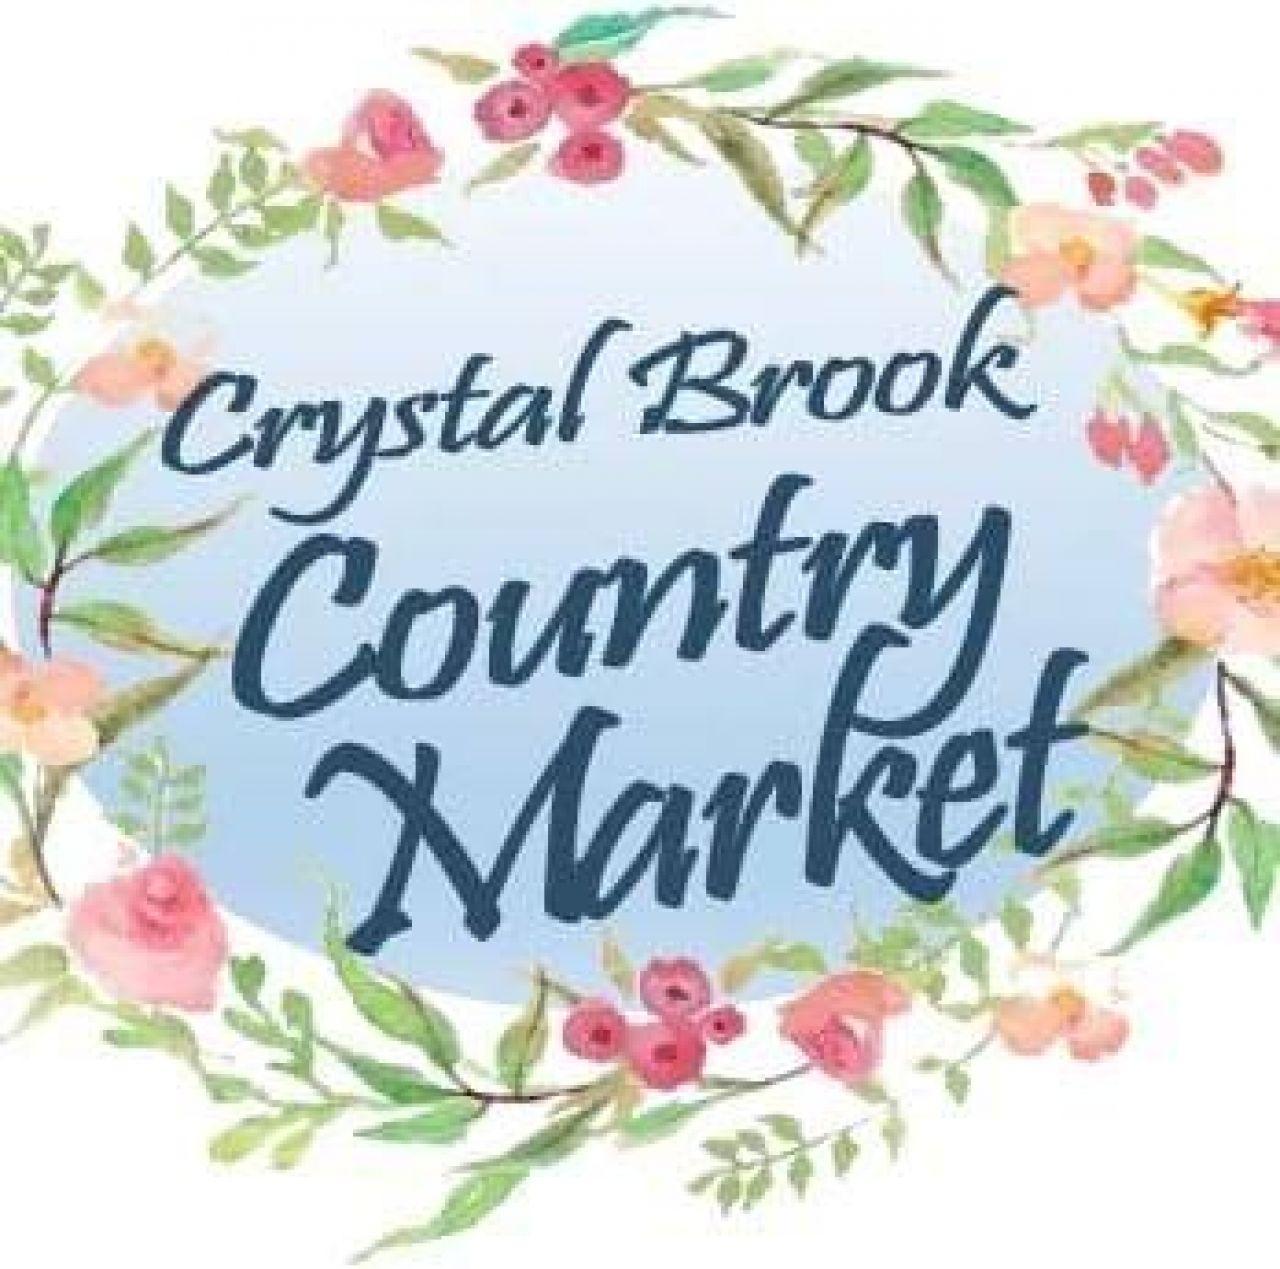 Crystal Brook Market